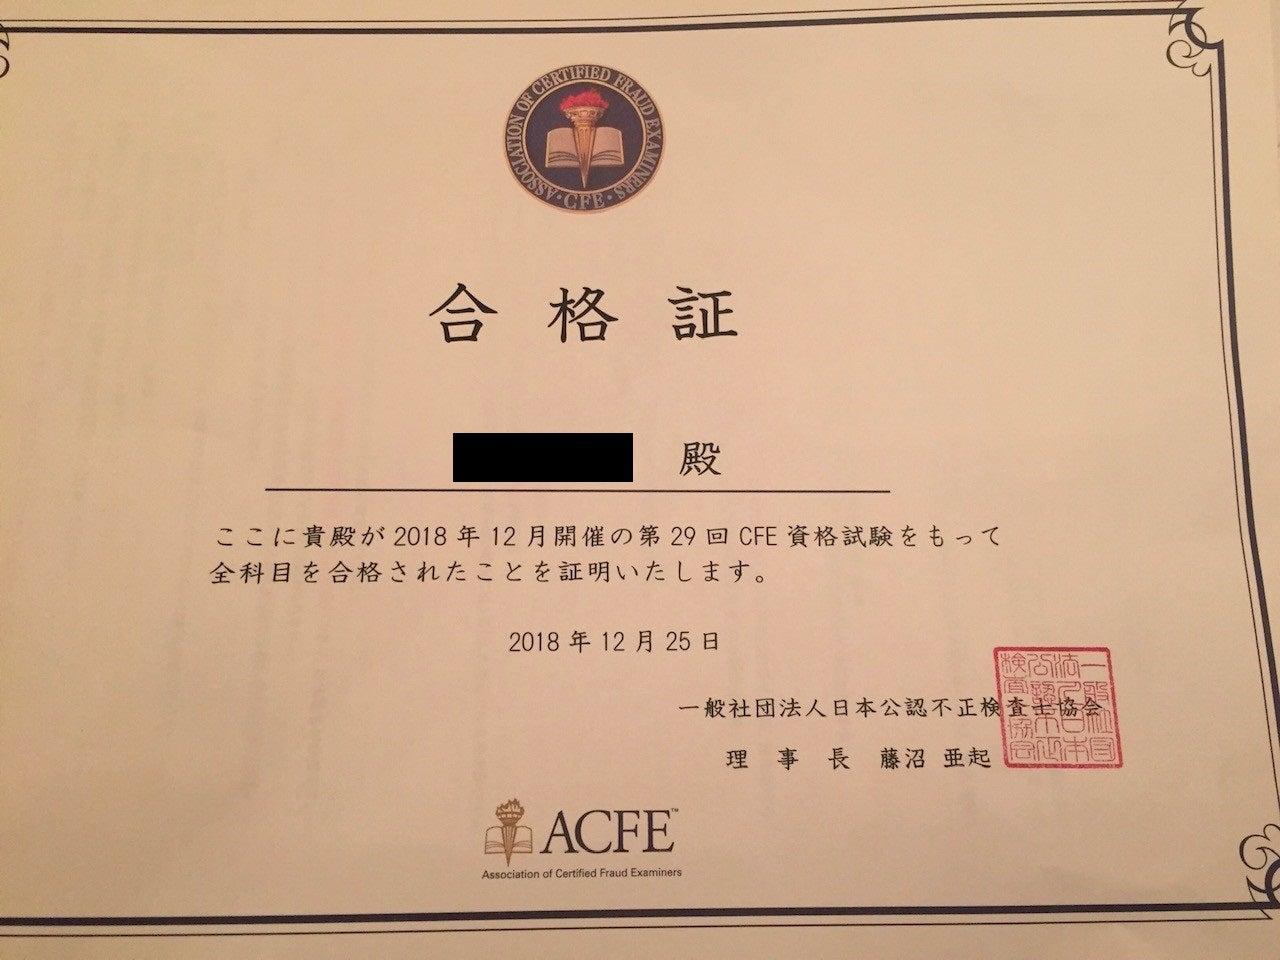 CFE:公認不正検査士,合格証 屆きました!! | Syoujin(精進)のブログ(CIA,CISA,英語、ランニング他)